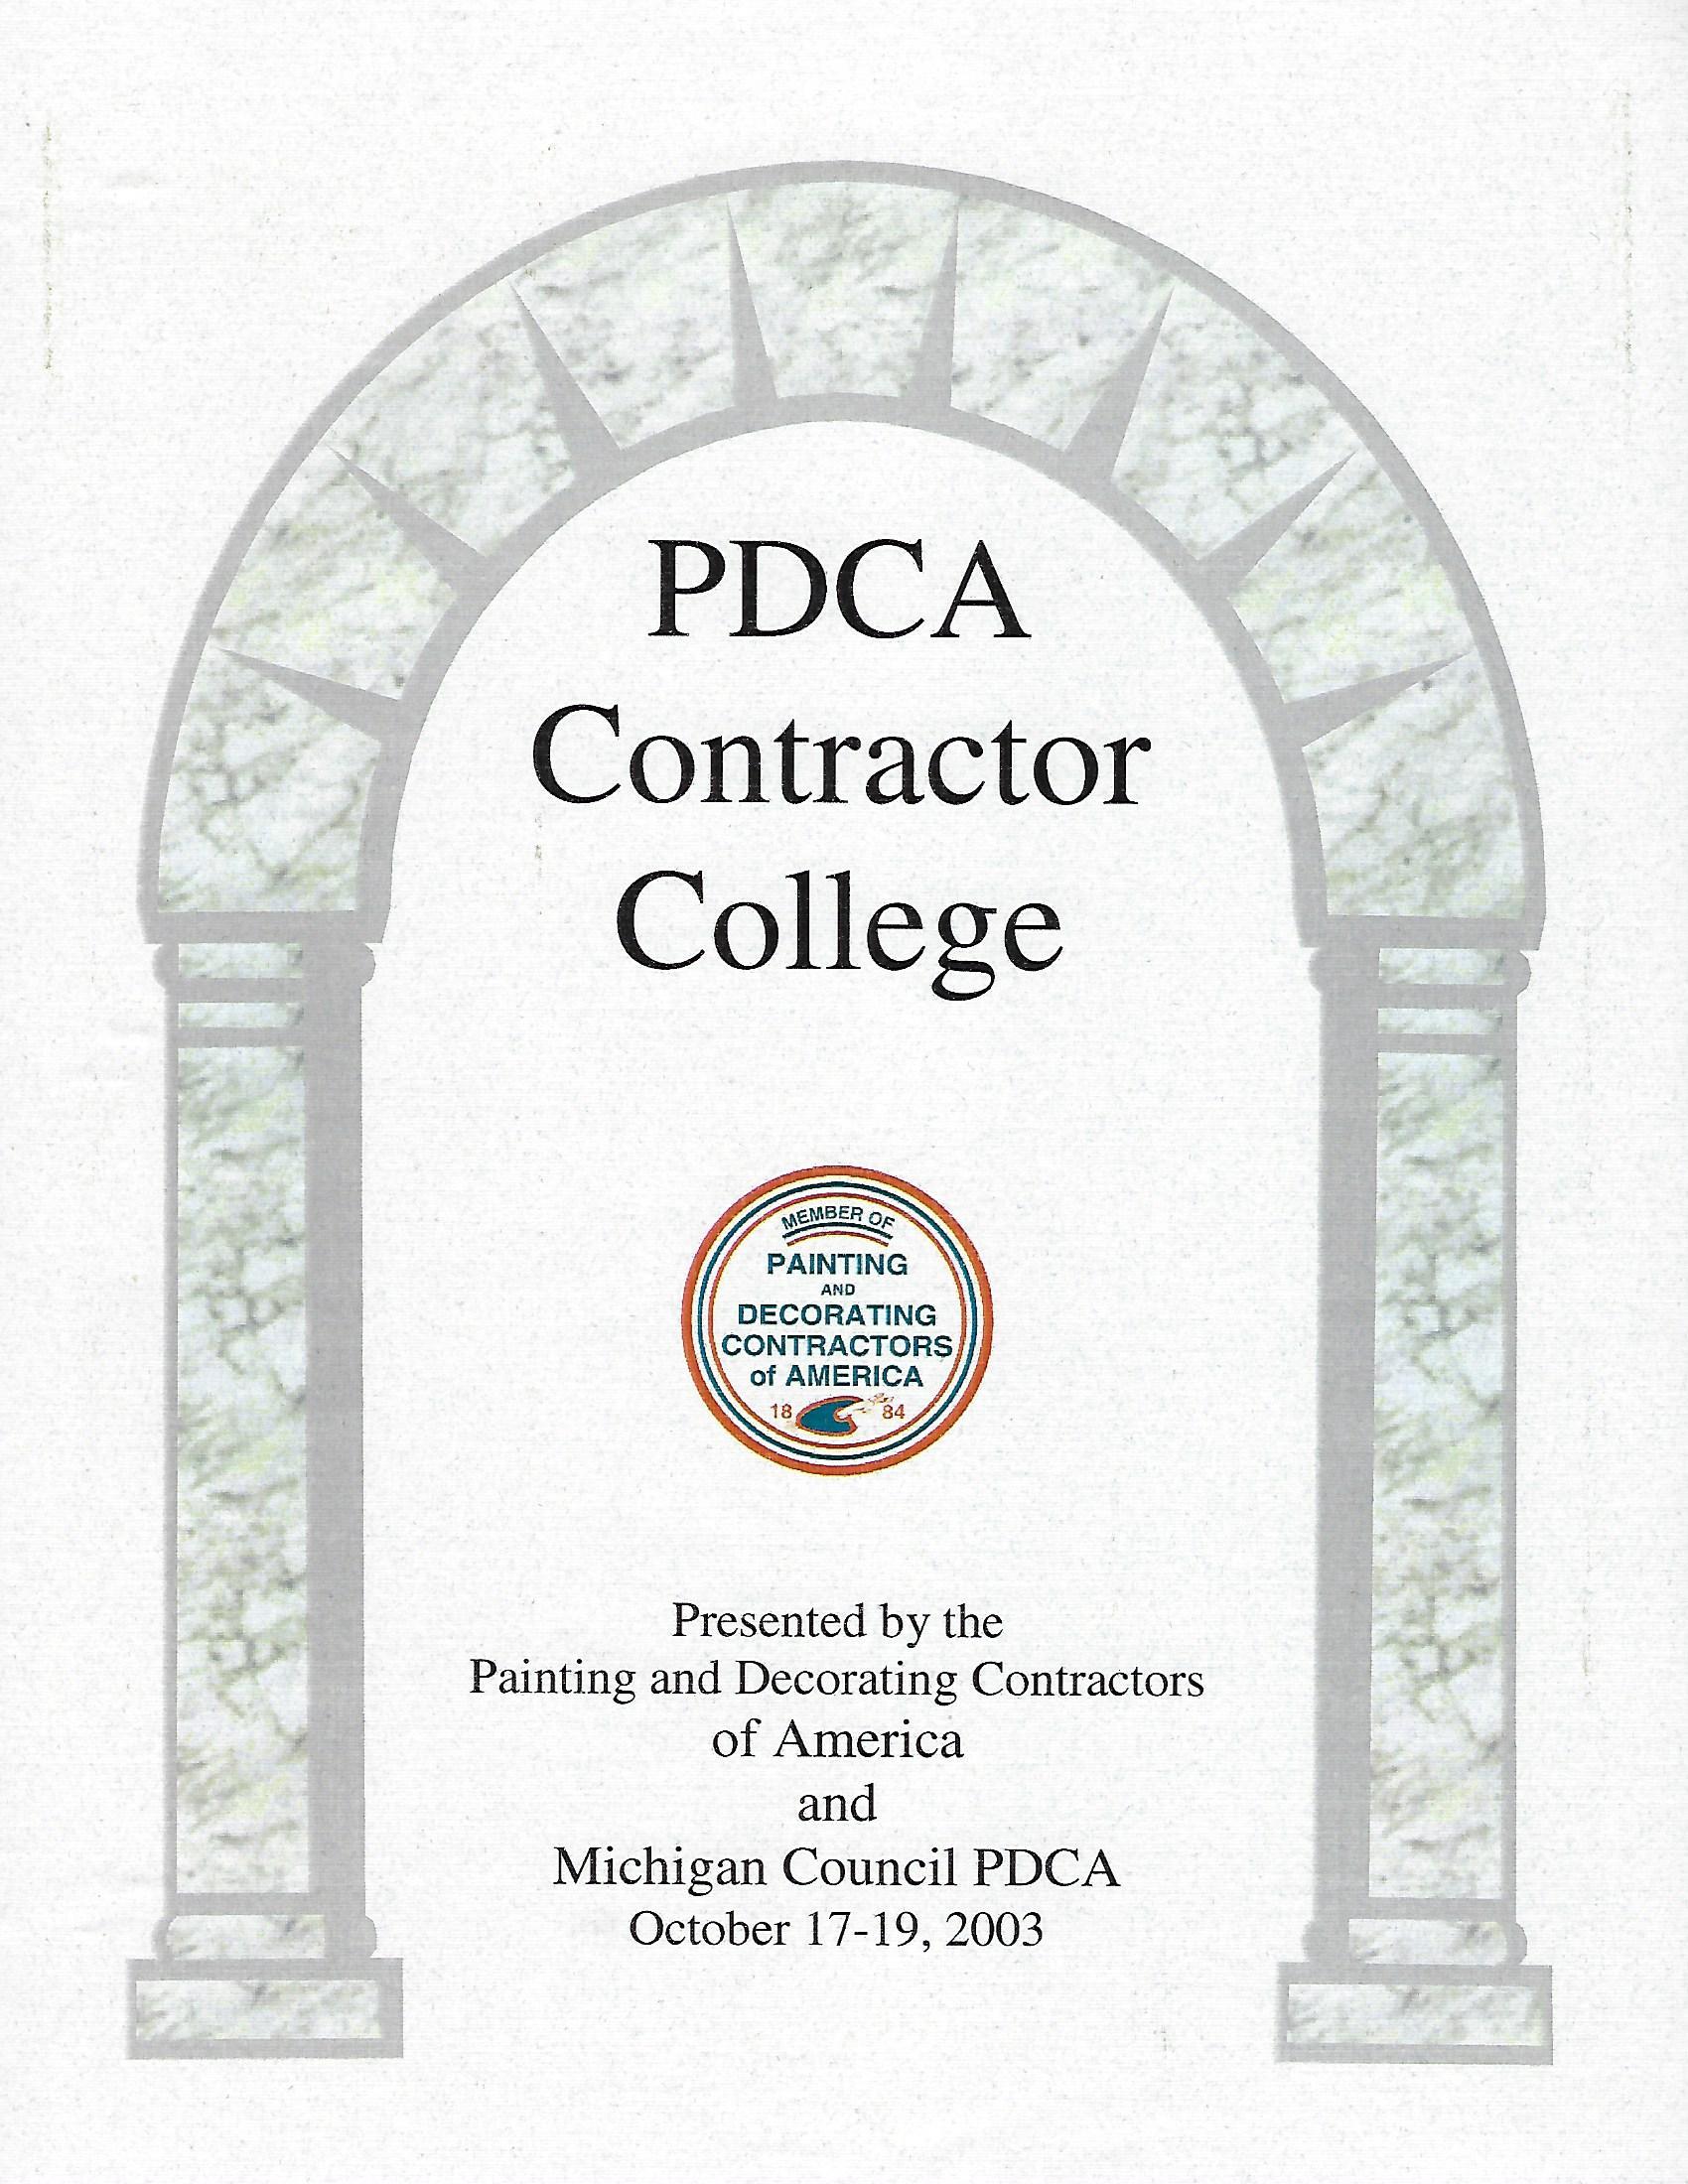 PDCA Contractor College Certificate